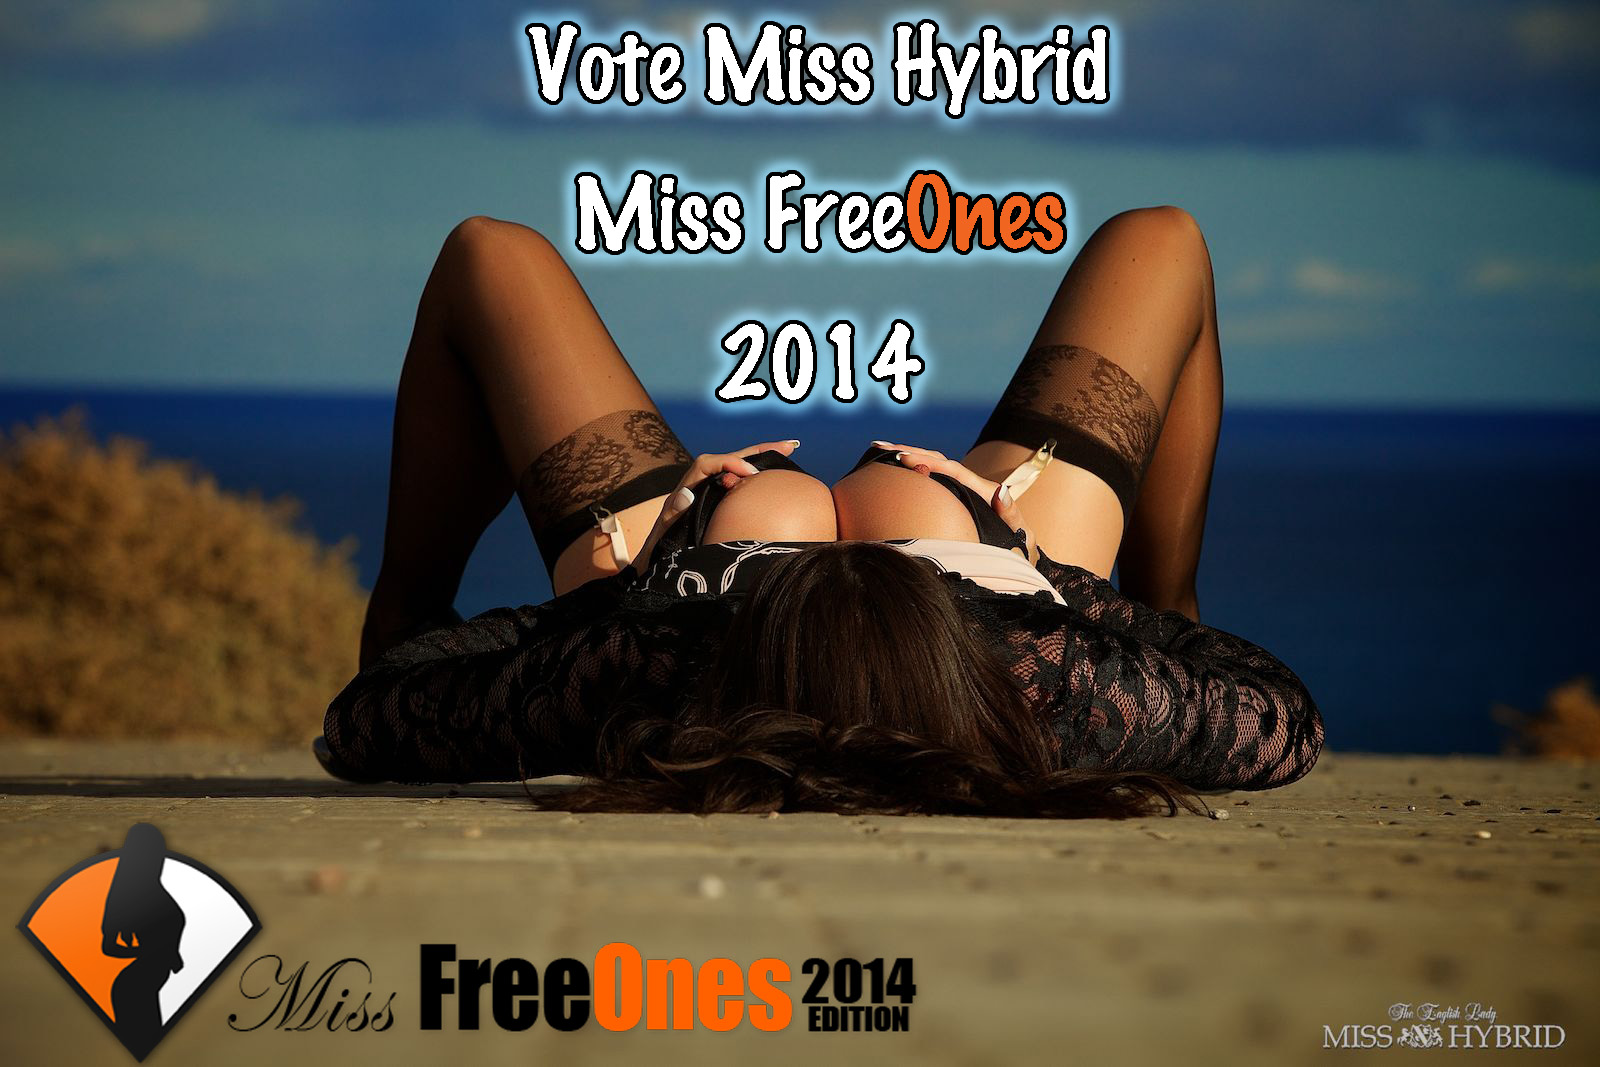 Miss Hybrid video reminder, Miss Hybrid, Miss FreeOnes 2014